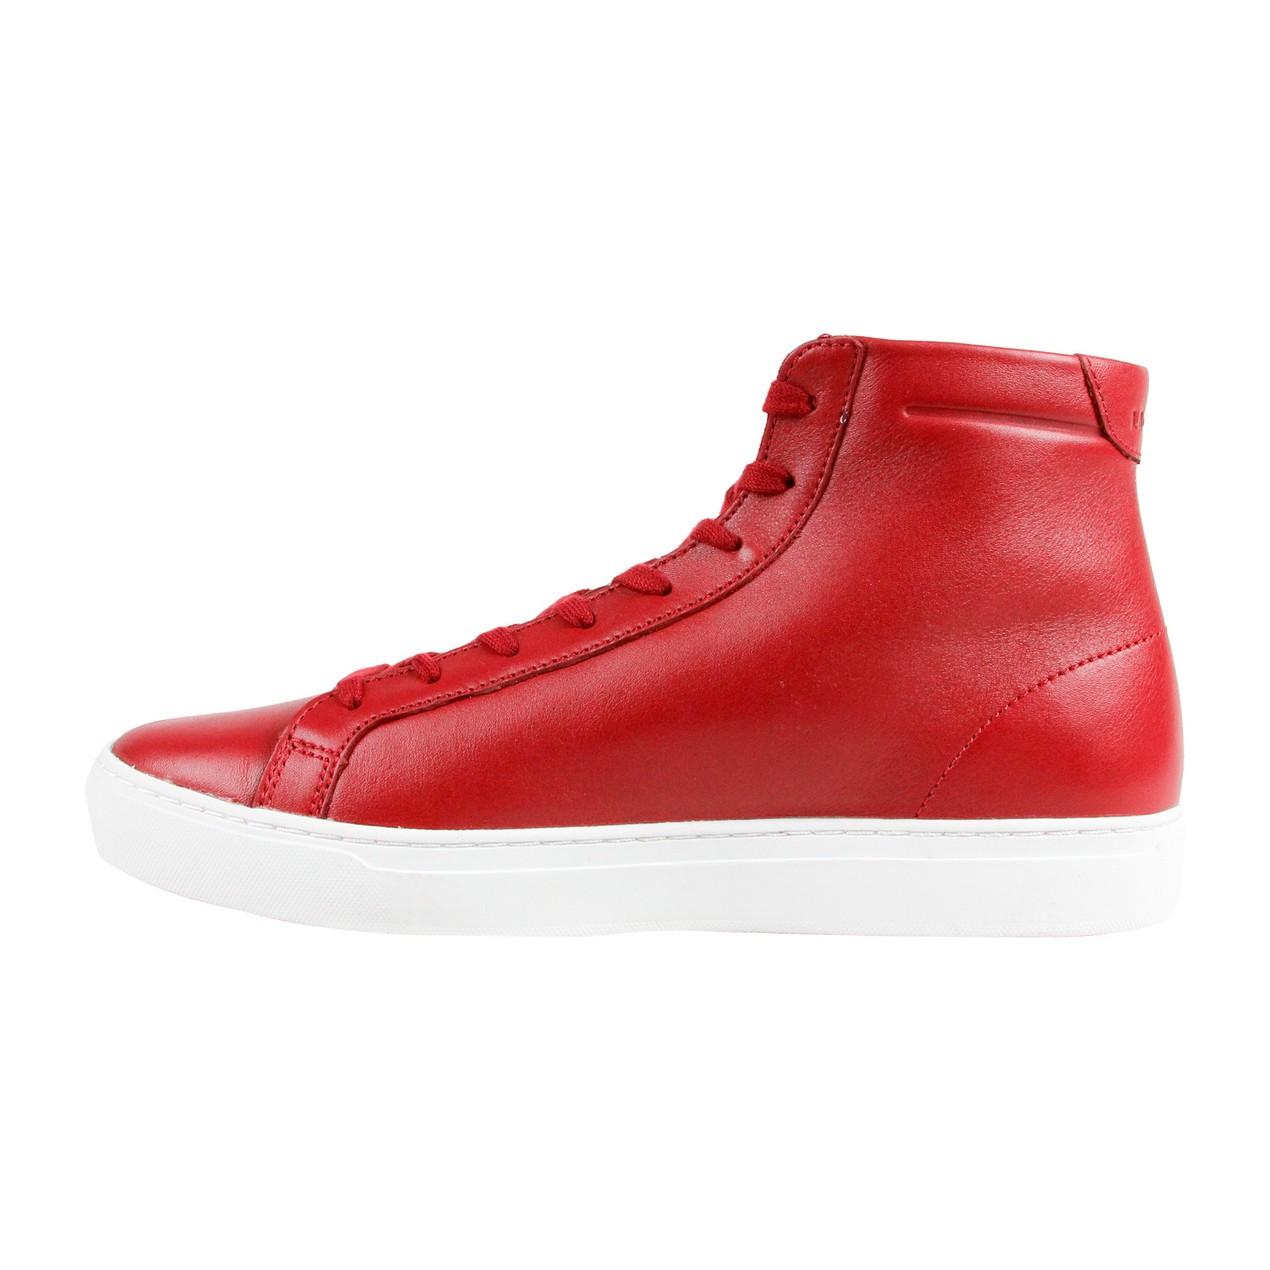 0b0070ec68f8 Lacoste Mens L.12.12 Mid 316 1 Cam Sneakers Shoes - Tanga